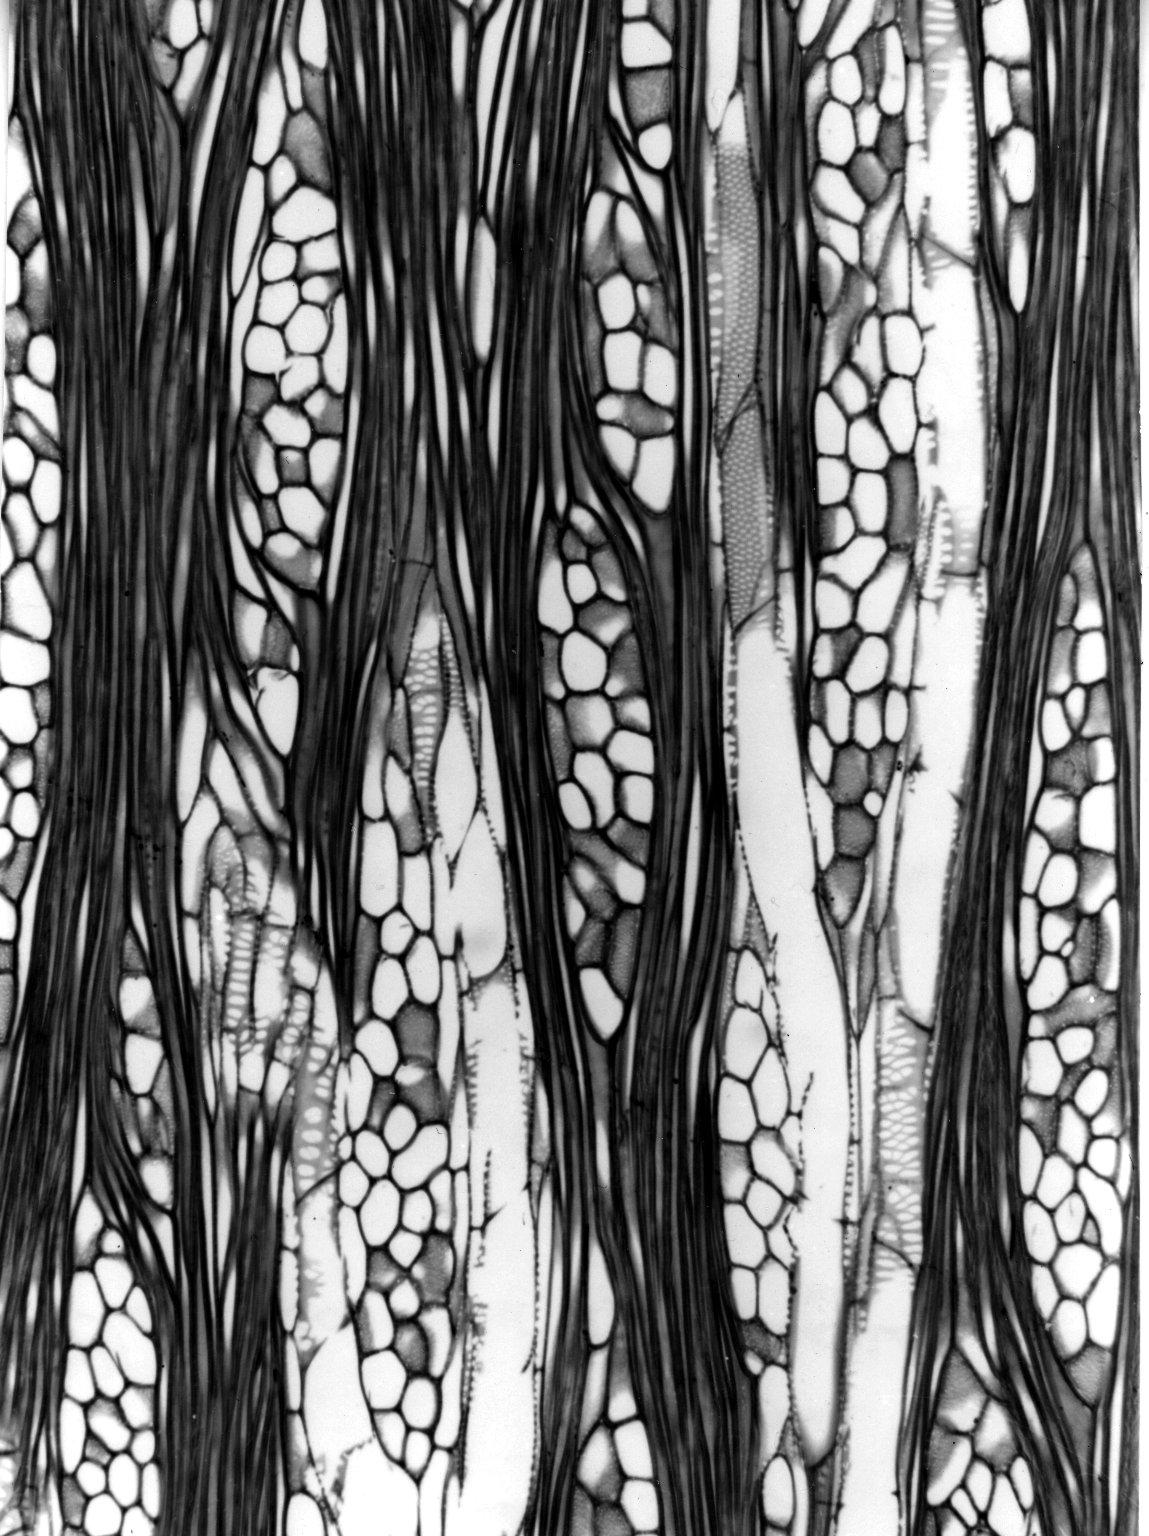 DIDIEREACEAE Alluaudiopsis fiherenensis